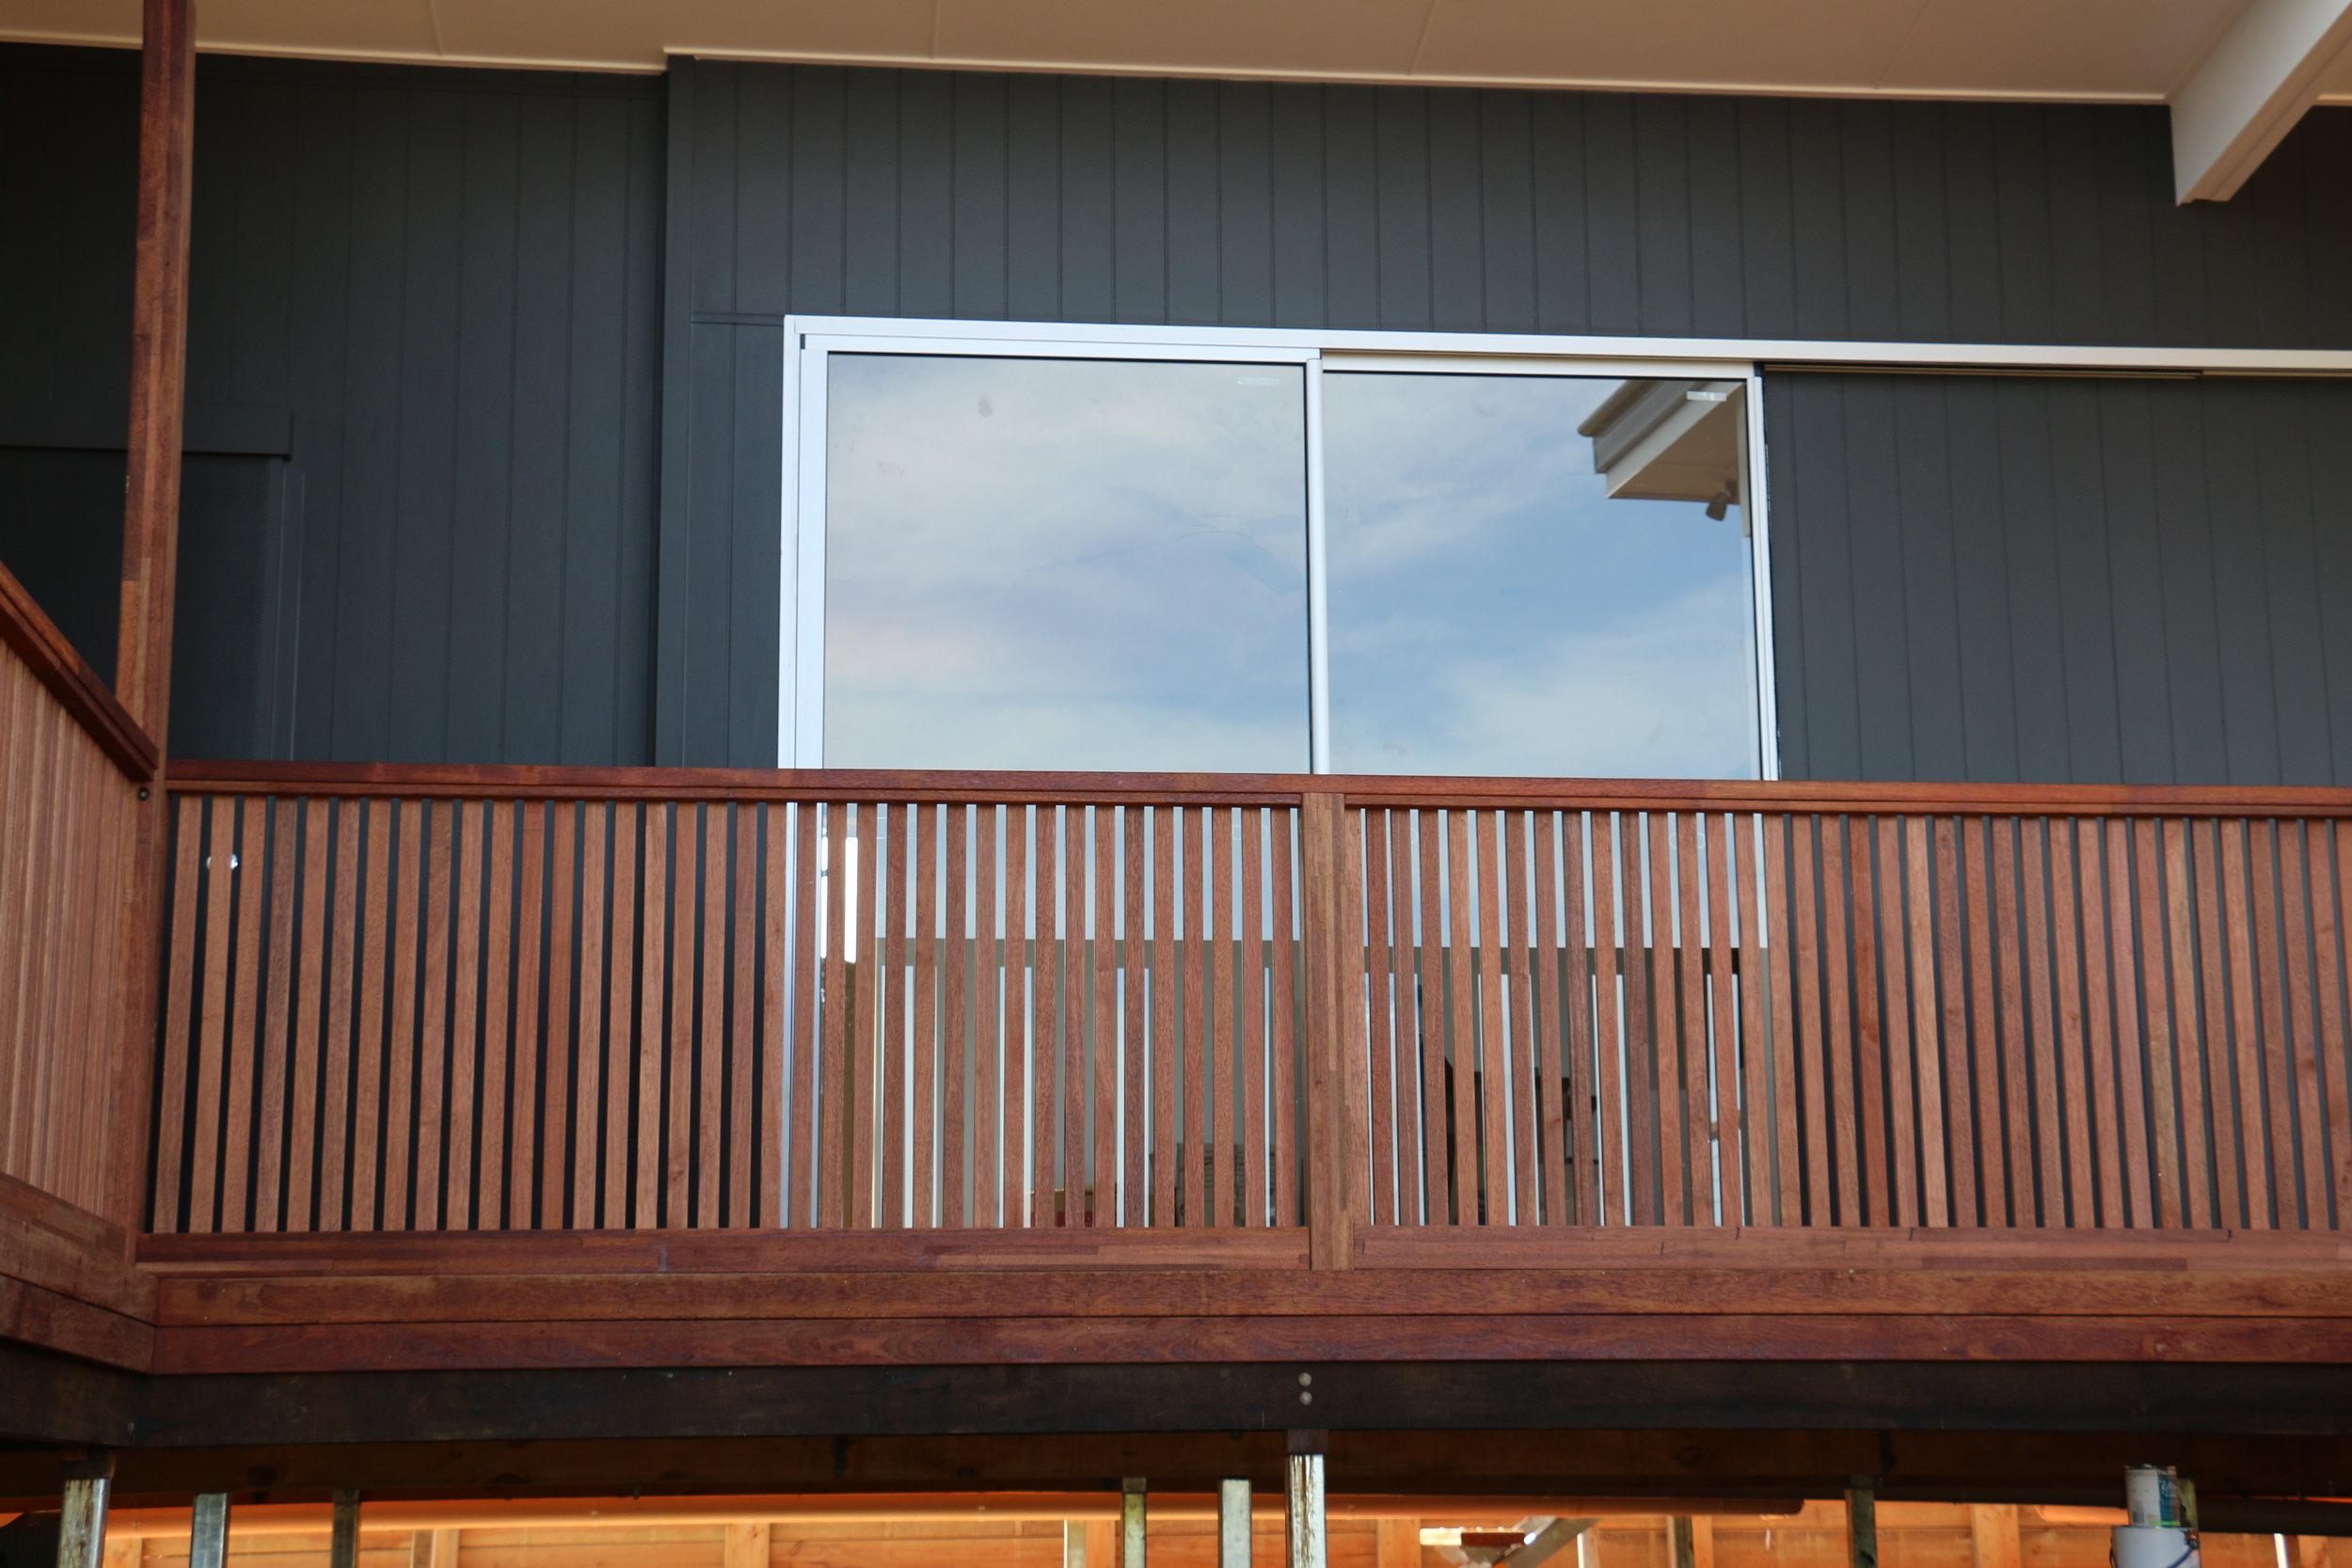 balustrade detail.JPG